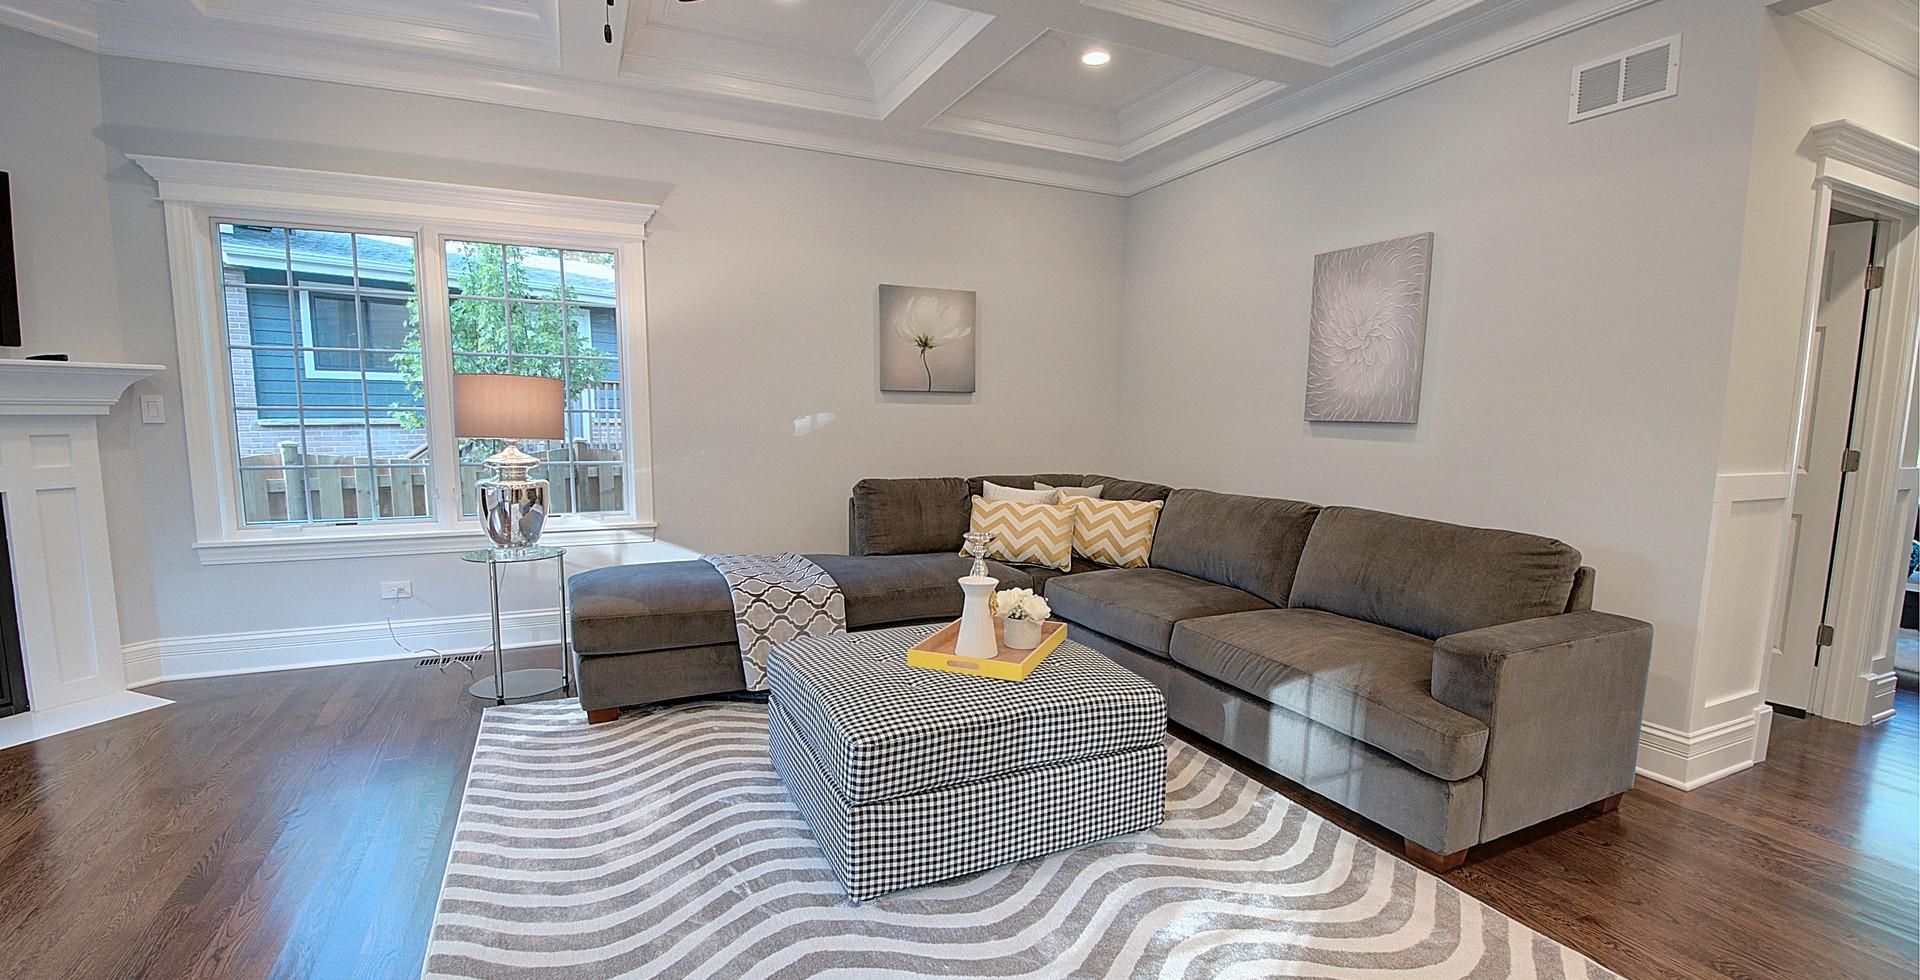 Living Room in Addison designed by MRM Home Design.jpg